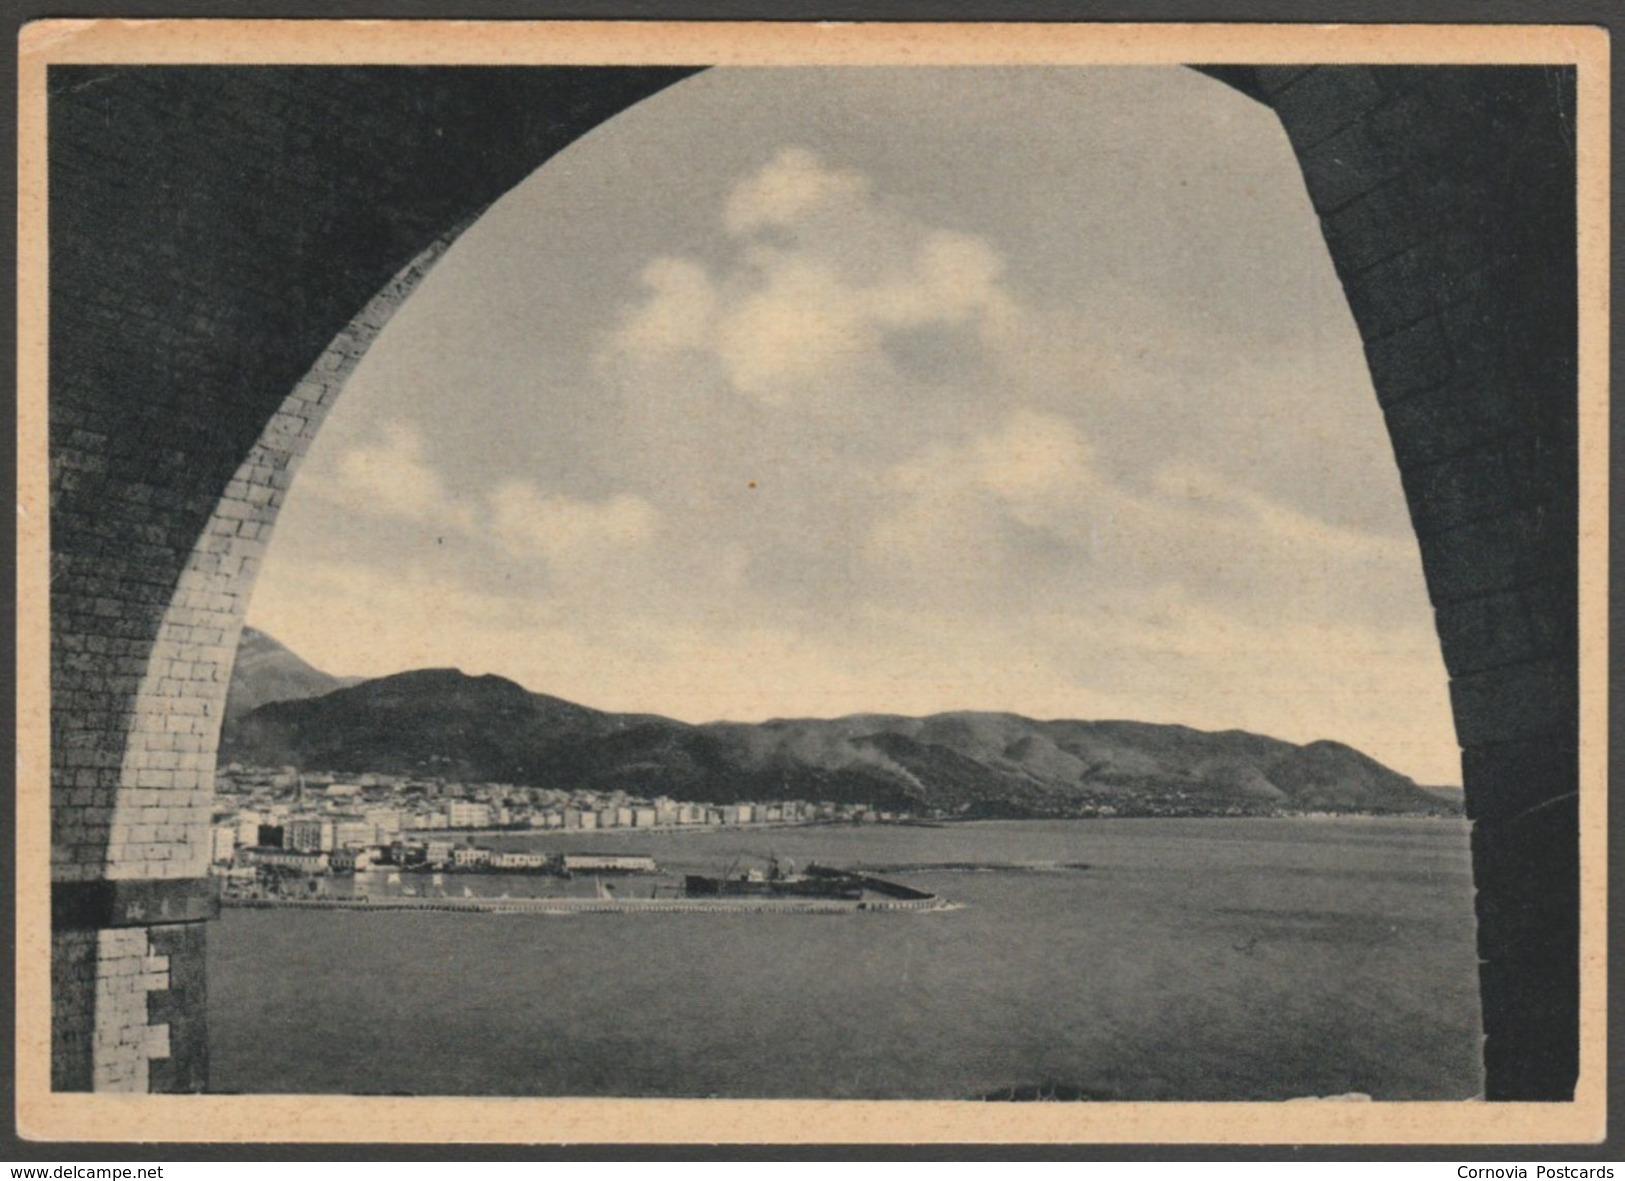 Panorama Dal Tunnel, Salerno, Campania, C.1940s - Cataneo Cartolina - Salerno